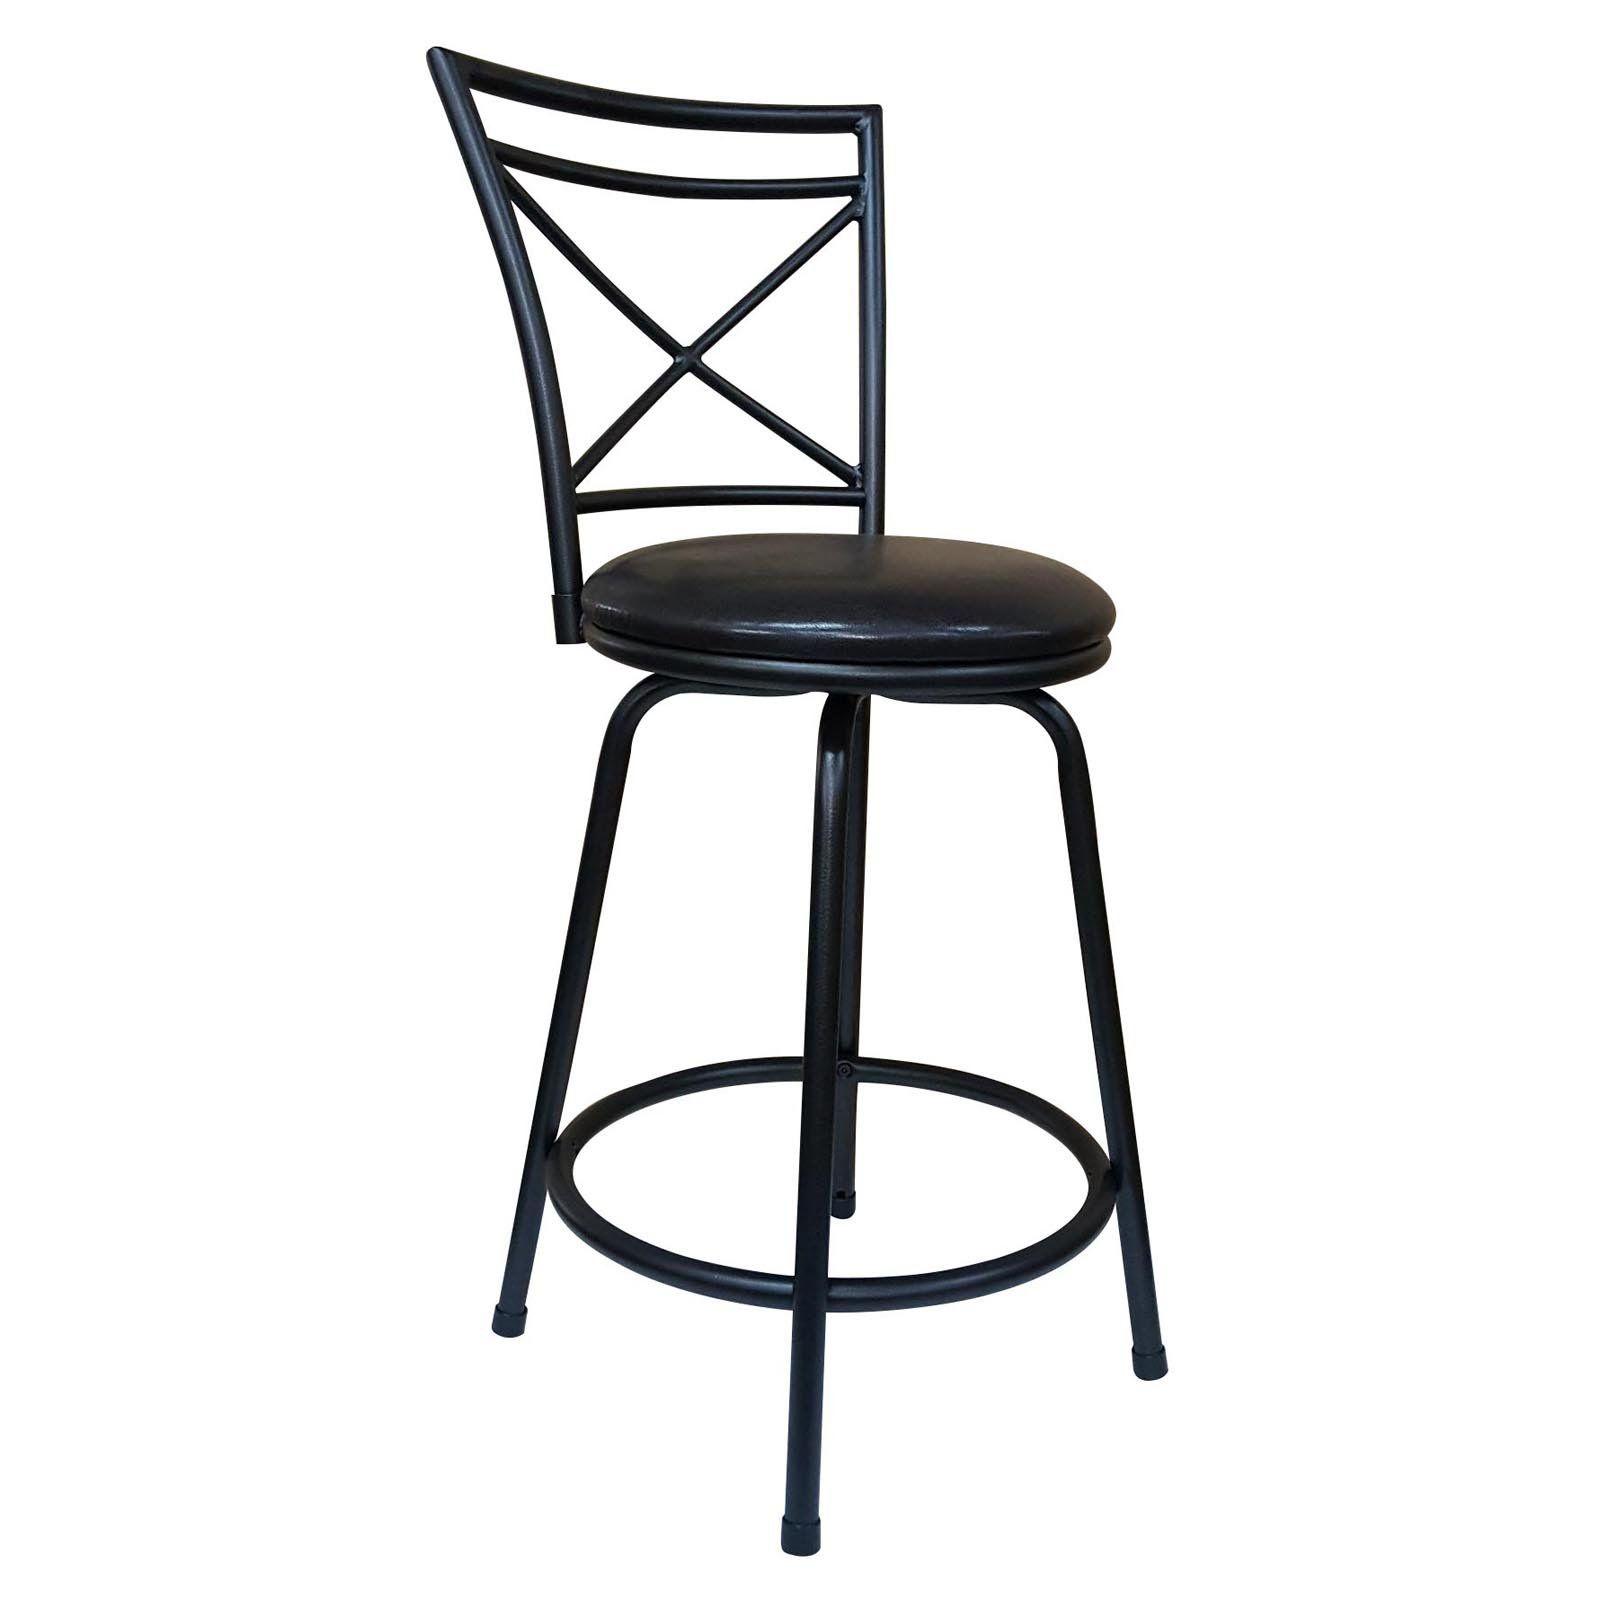 Incredible Roundhill Furniture Ciniya Adjustable Height Metal Bar Stool Theyellowbook Wood Chair Design Ideas Theyellowbookinfo